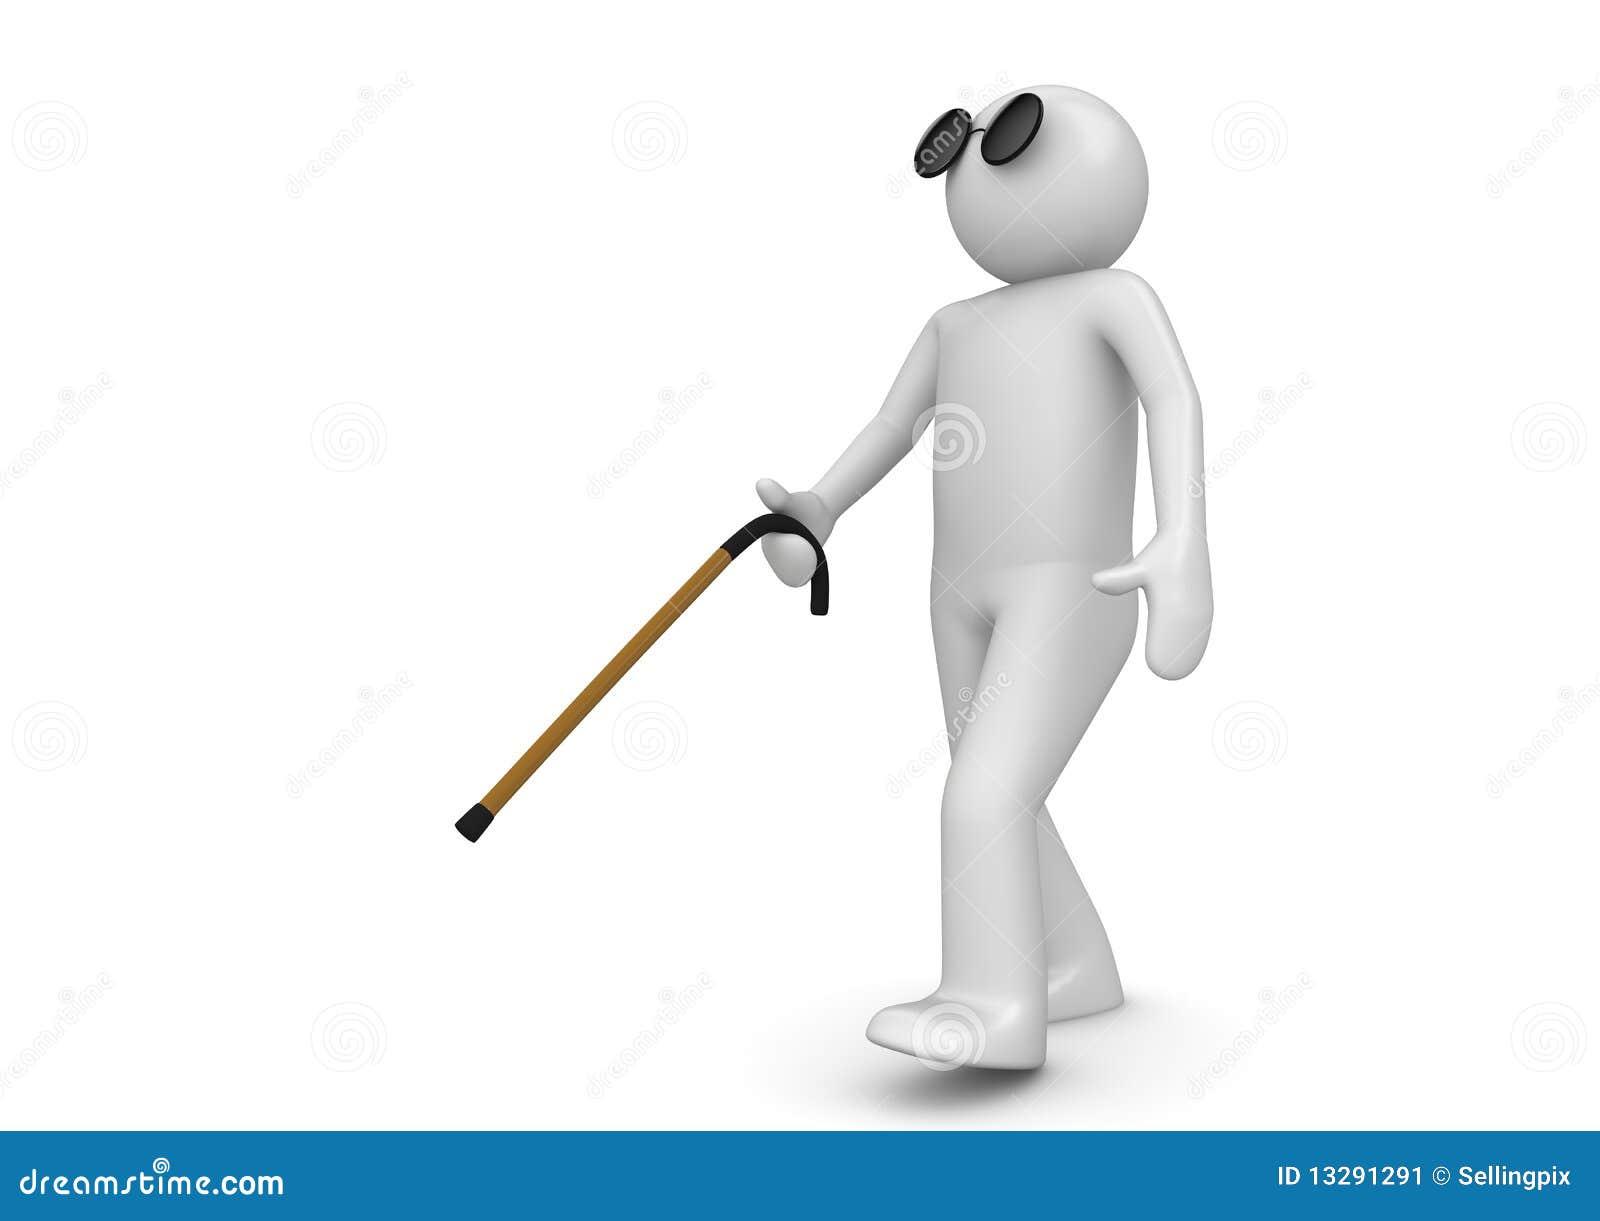 Blind Man With Walking Stick Stock Image - Image: 13291291